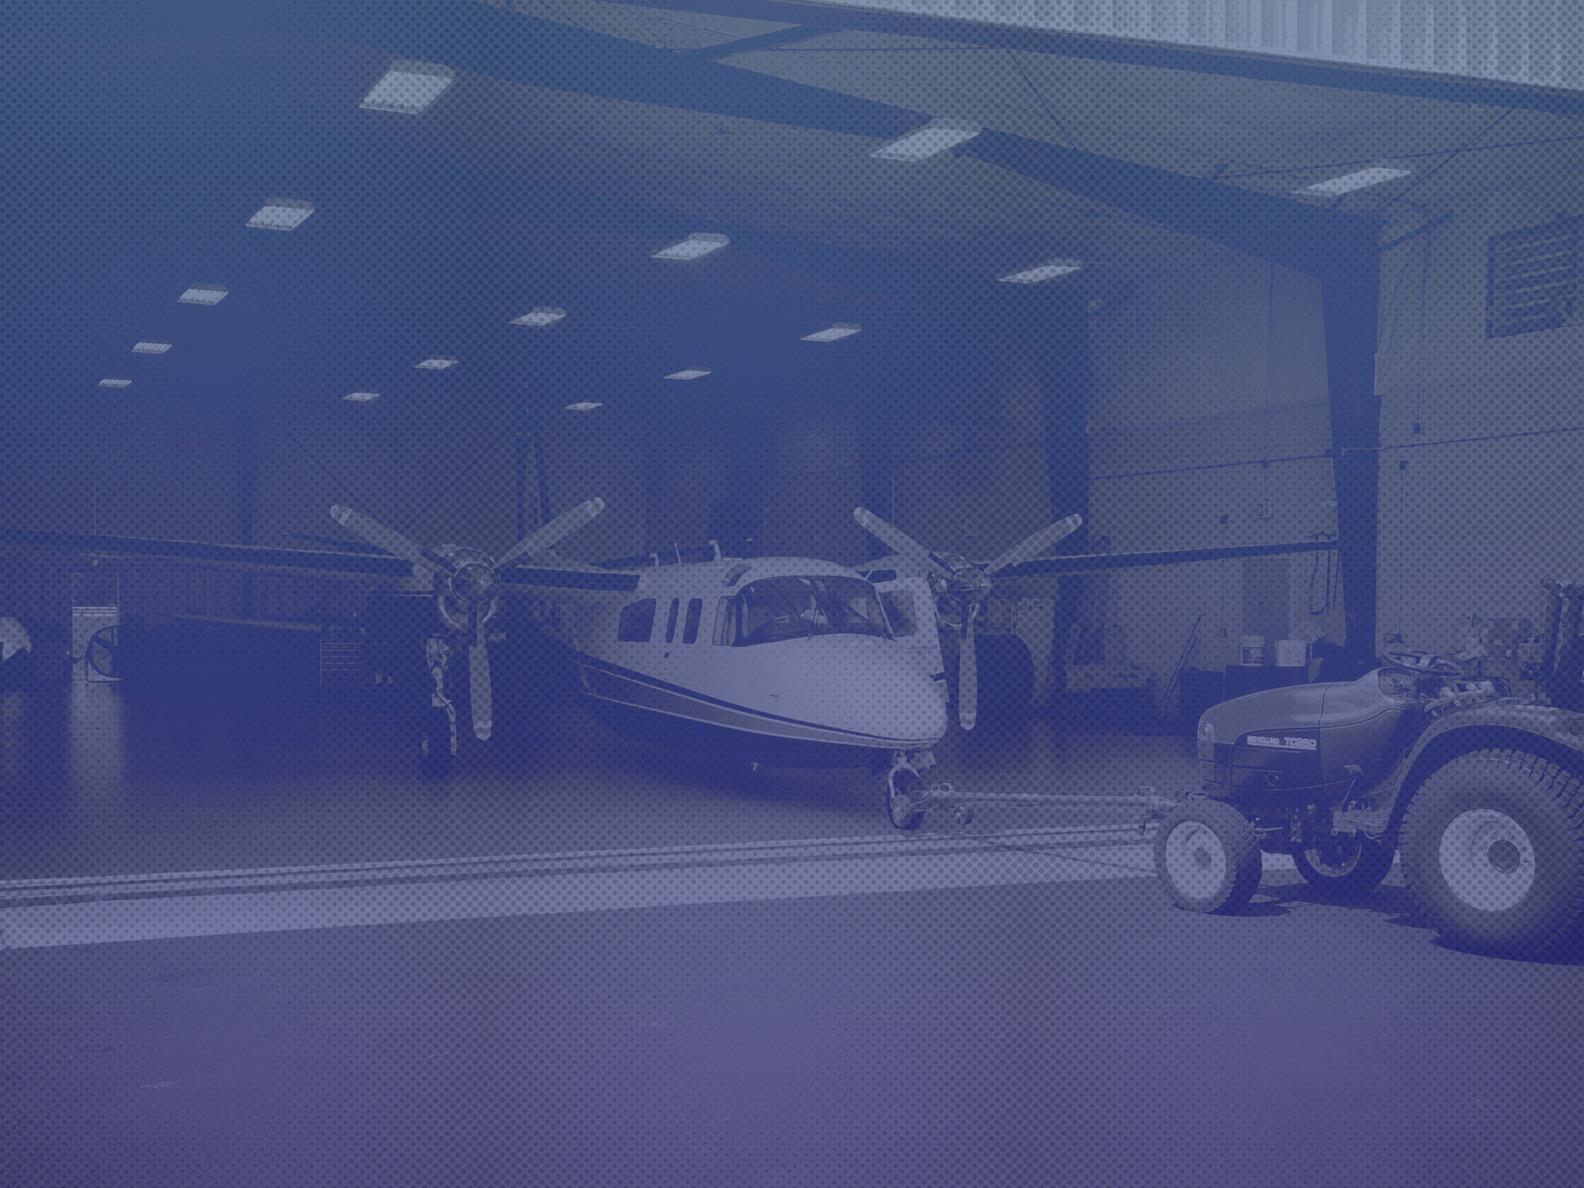 Airframe Maintenance